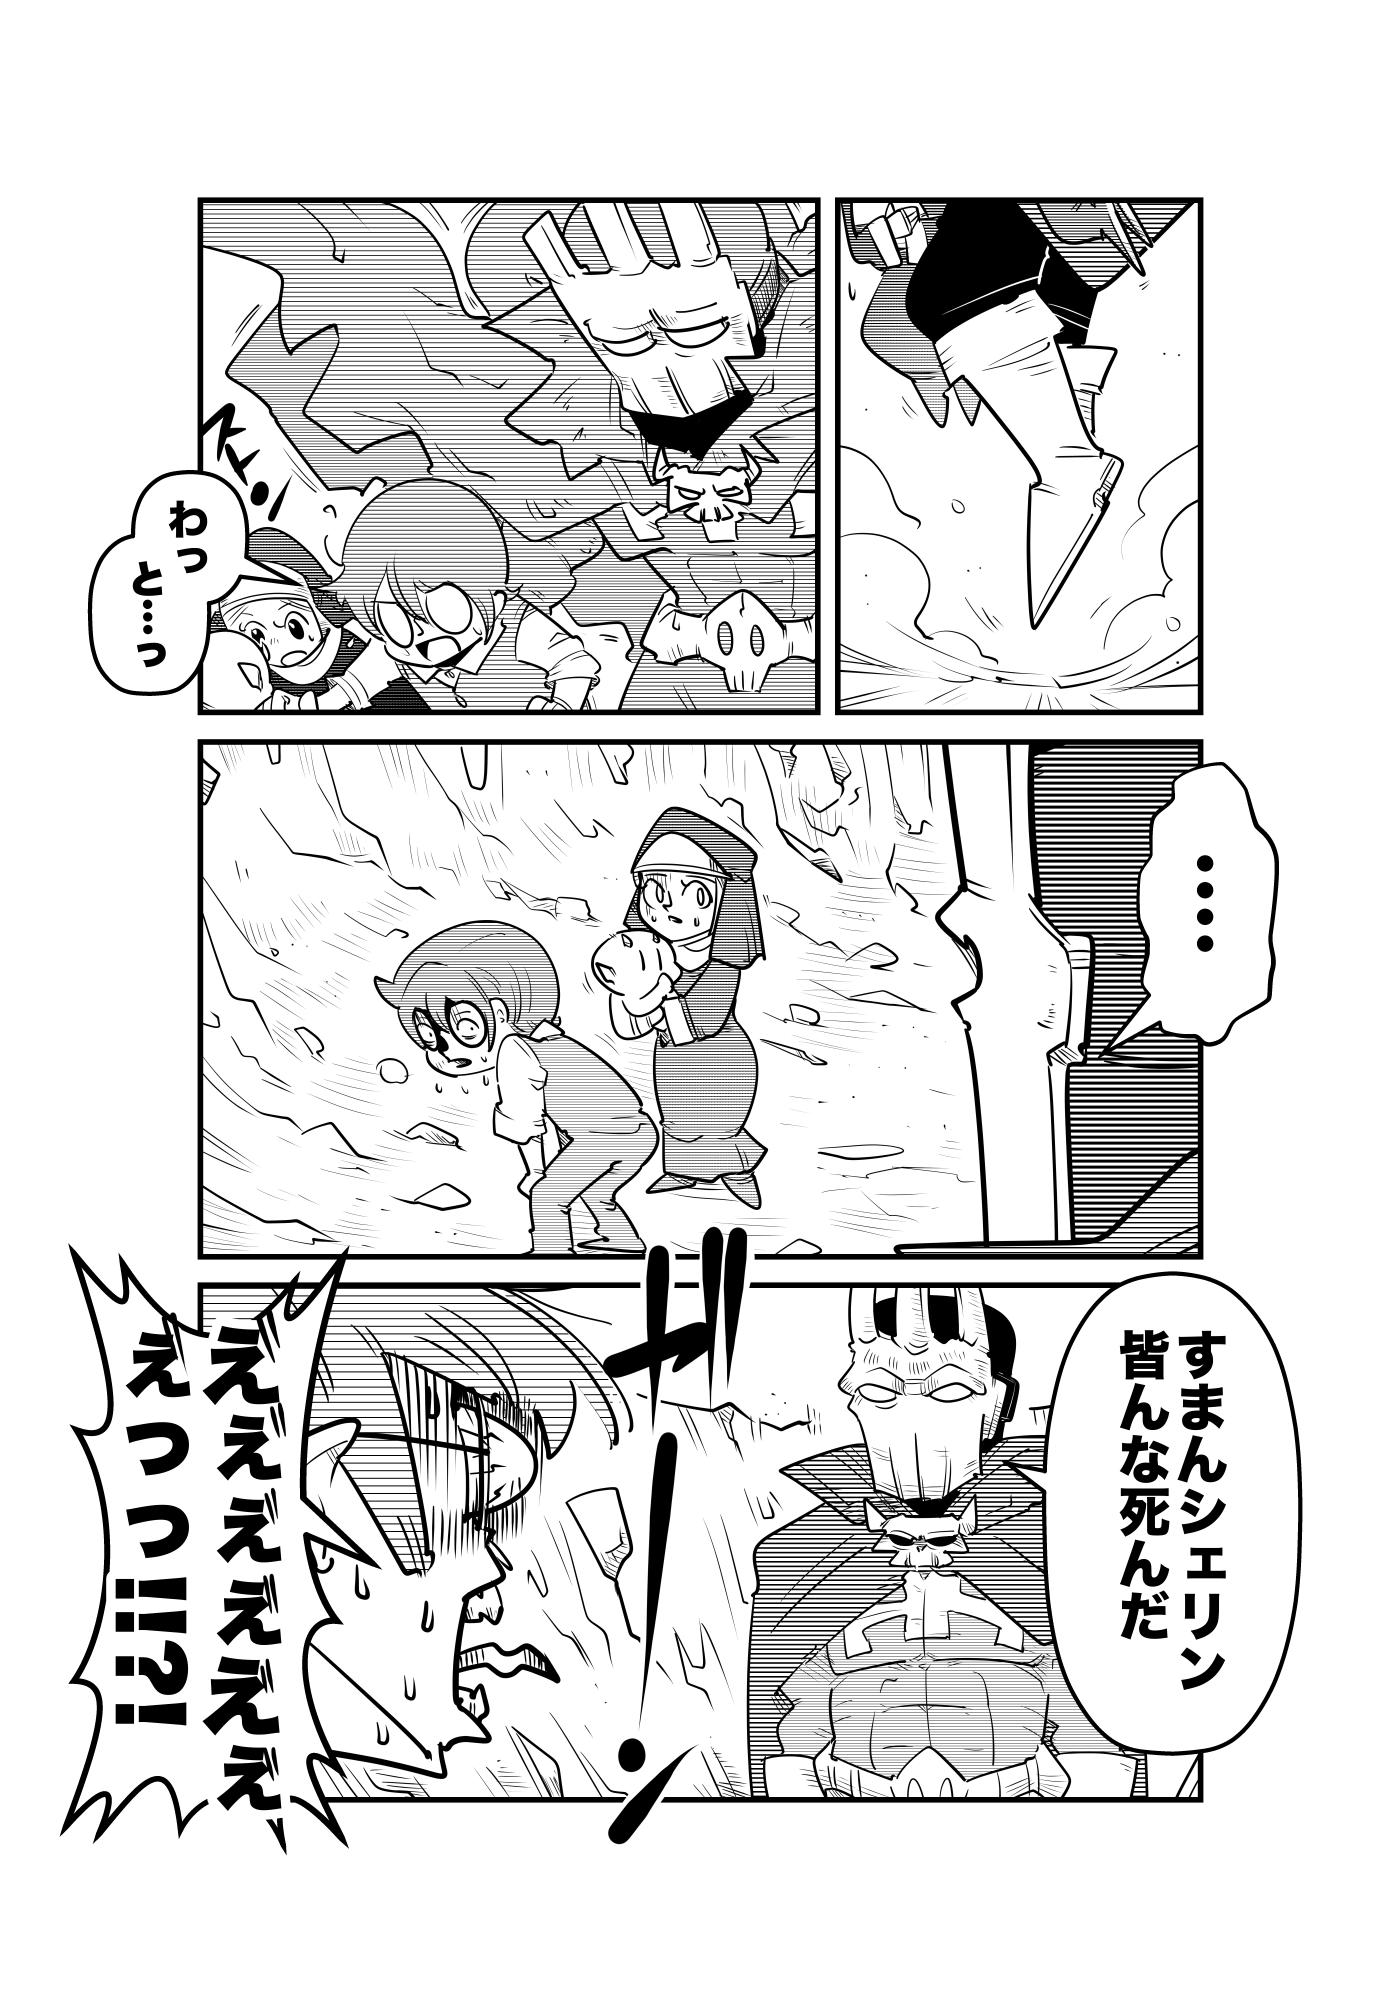 f:id:terashimaru117:20210914224516p:plain